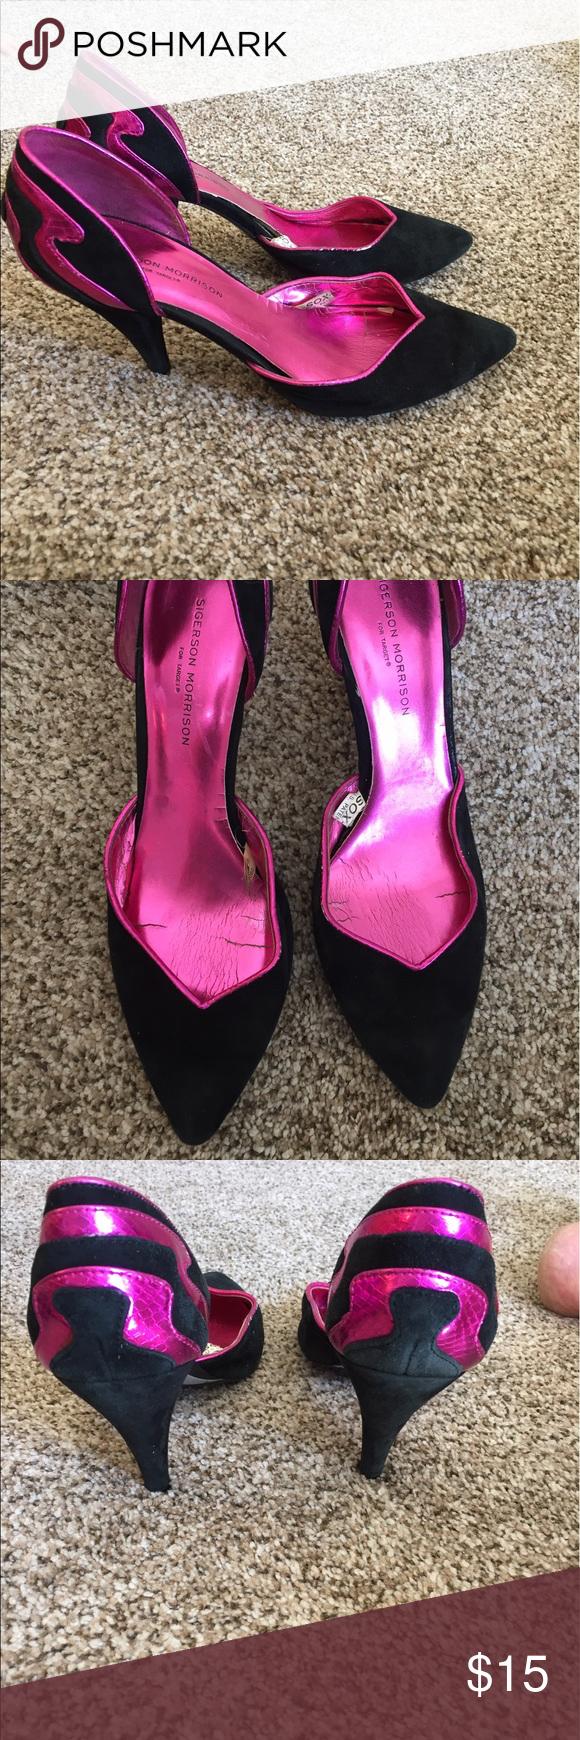 6e528c024 Size 10 Sigerson Morrison for Target pumps Pink and black. Sigerson  Morrison Shoes Heels